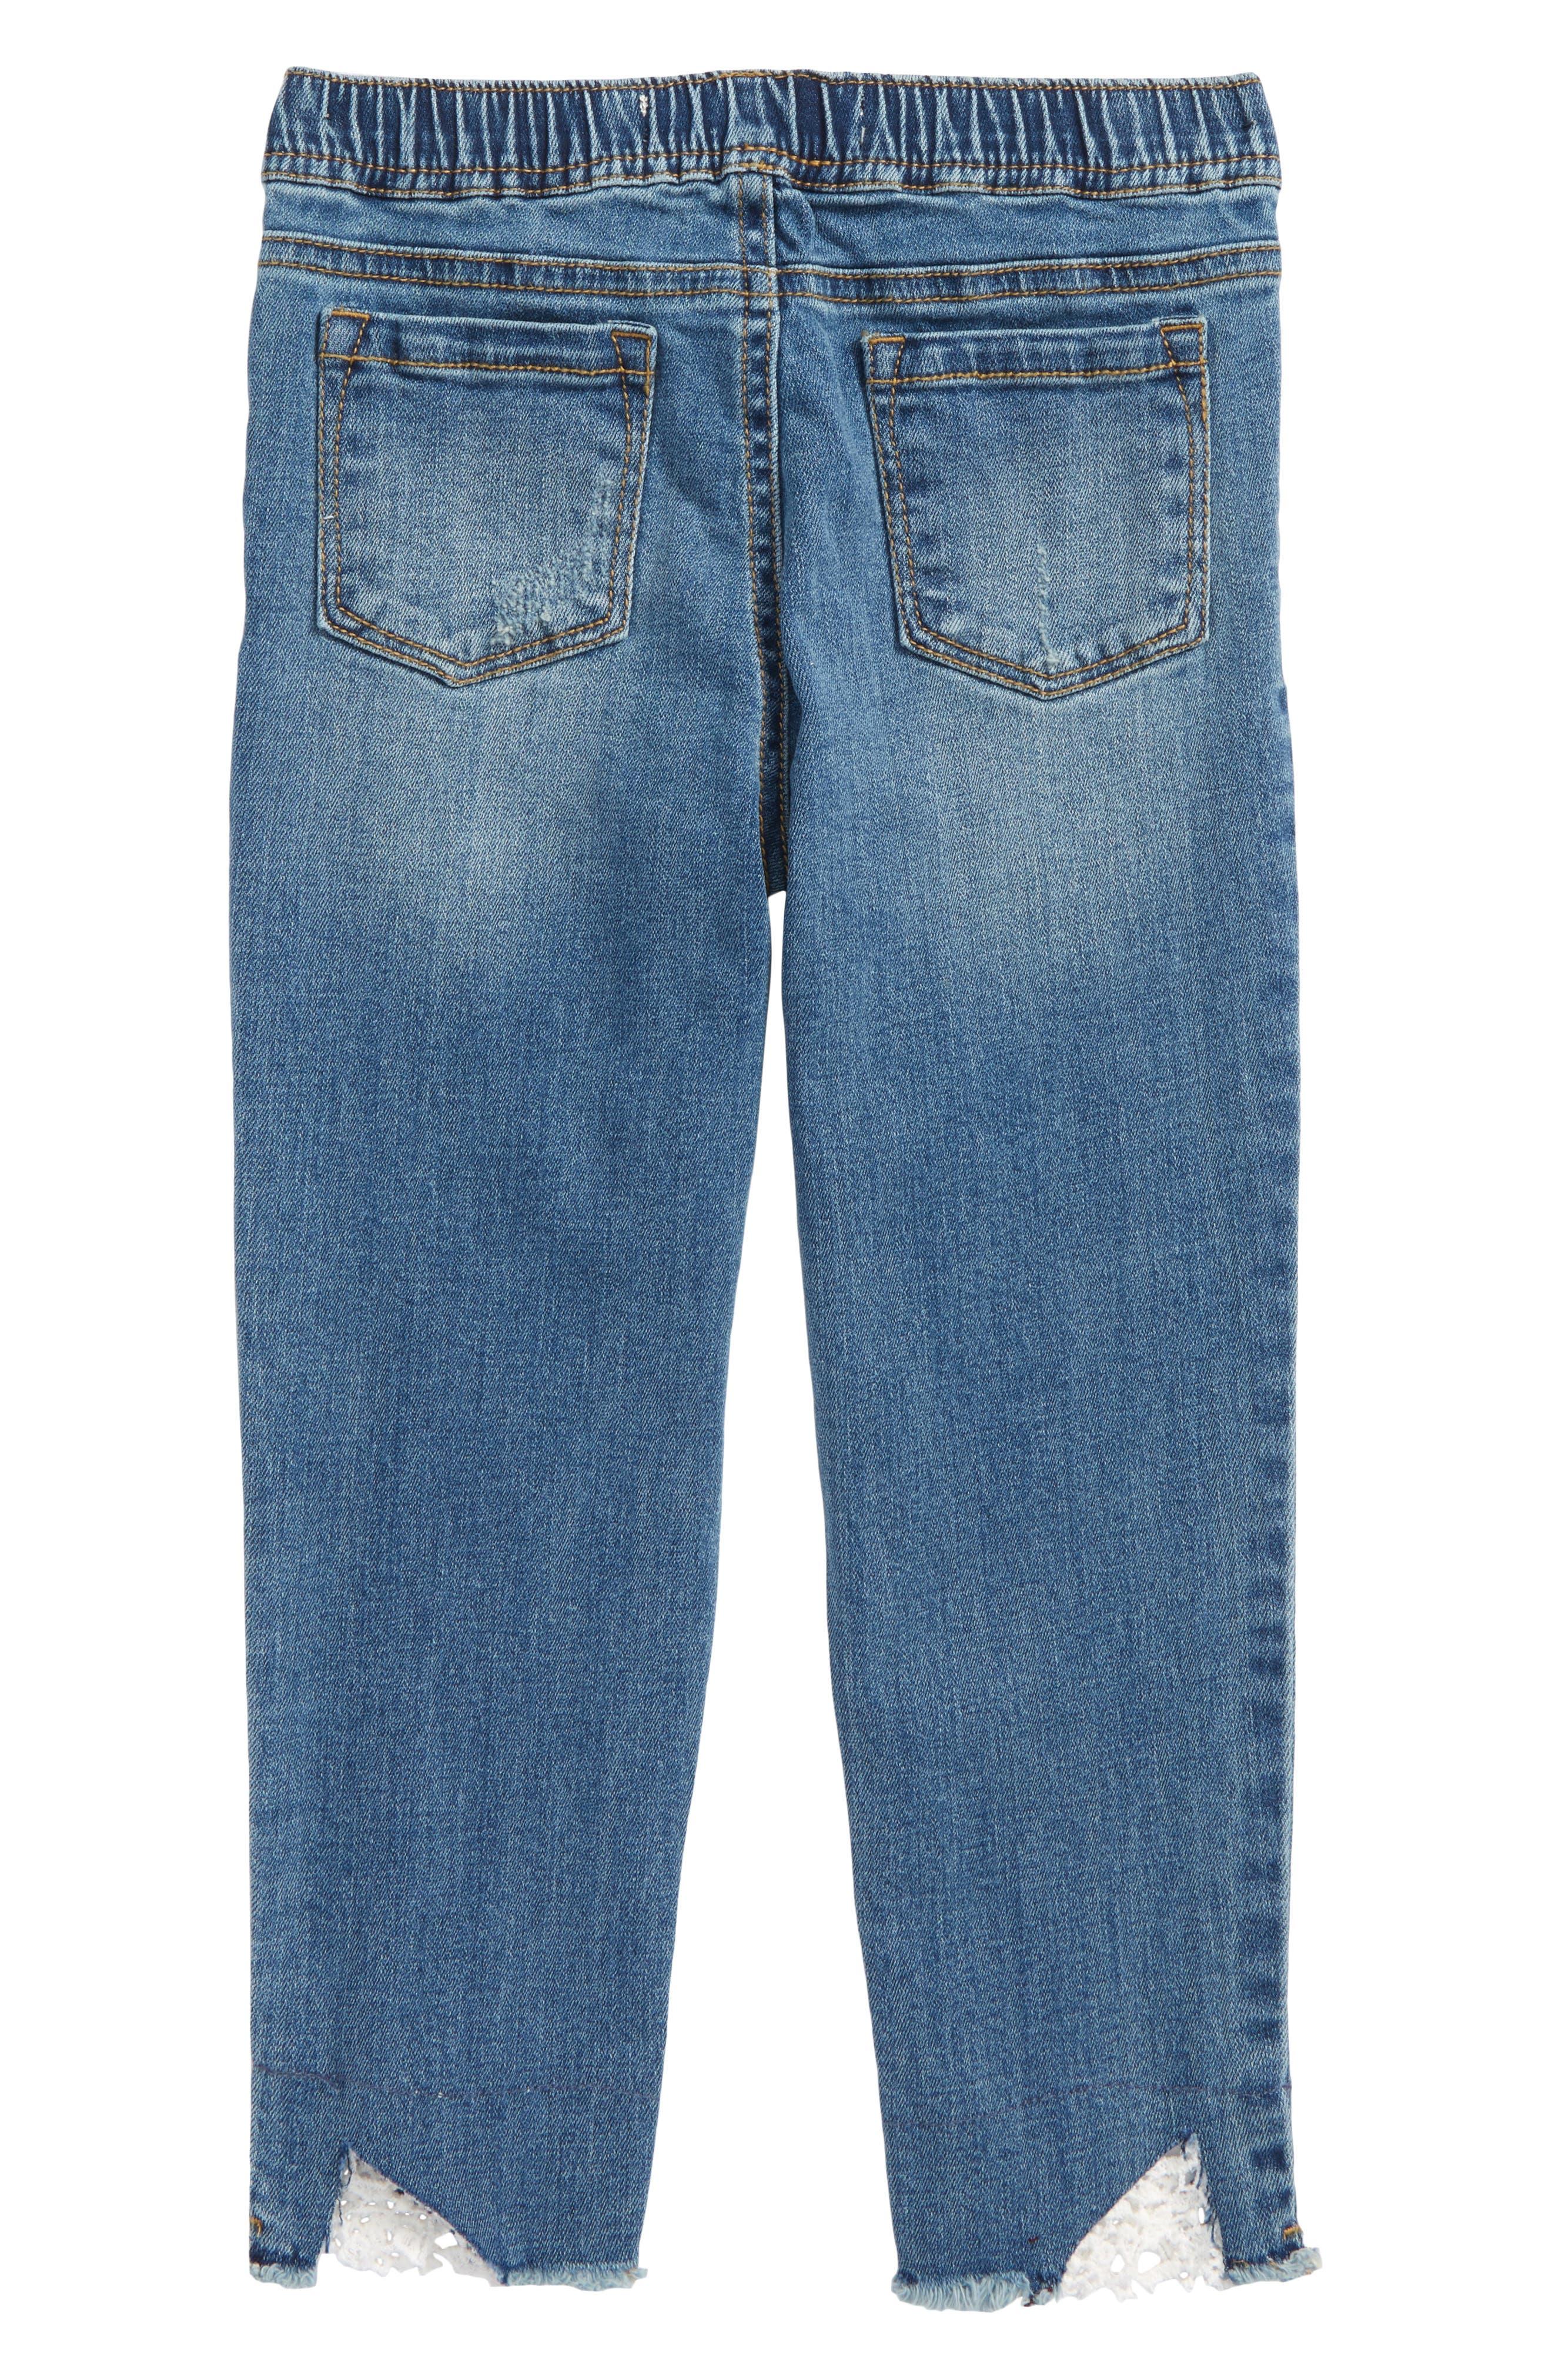 Crop Jeans,                             Alternate thumbnail 2, color,                             Lagoon Wash